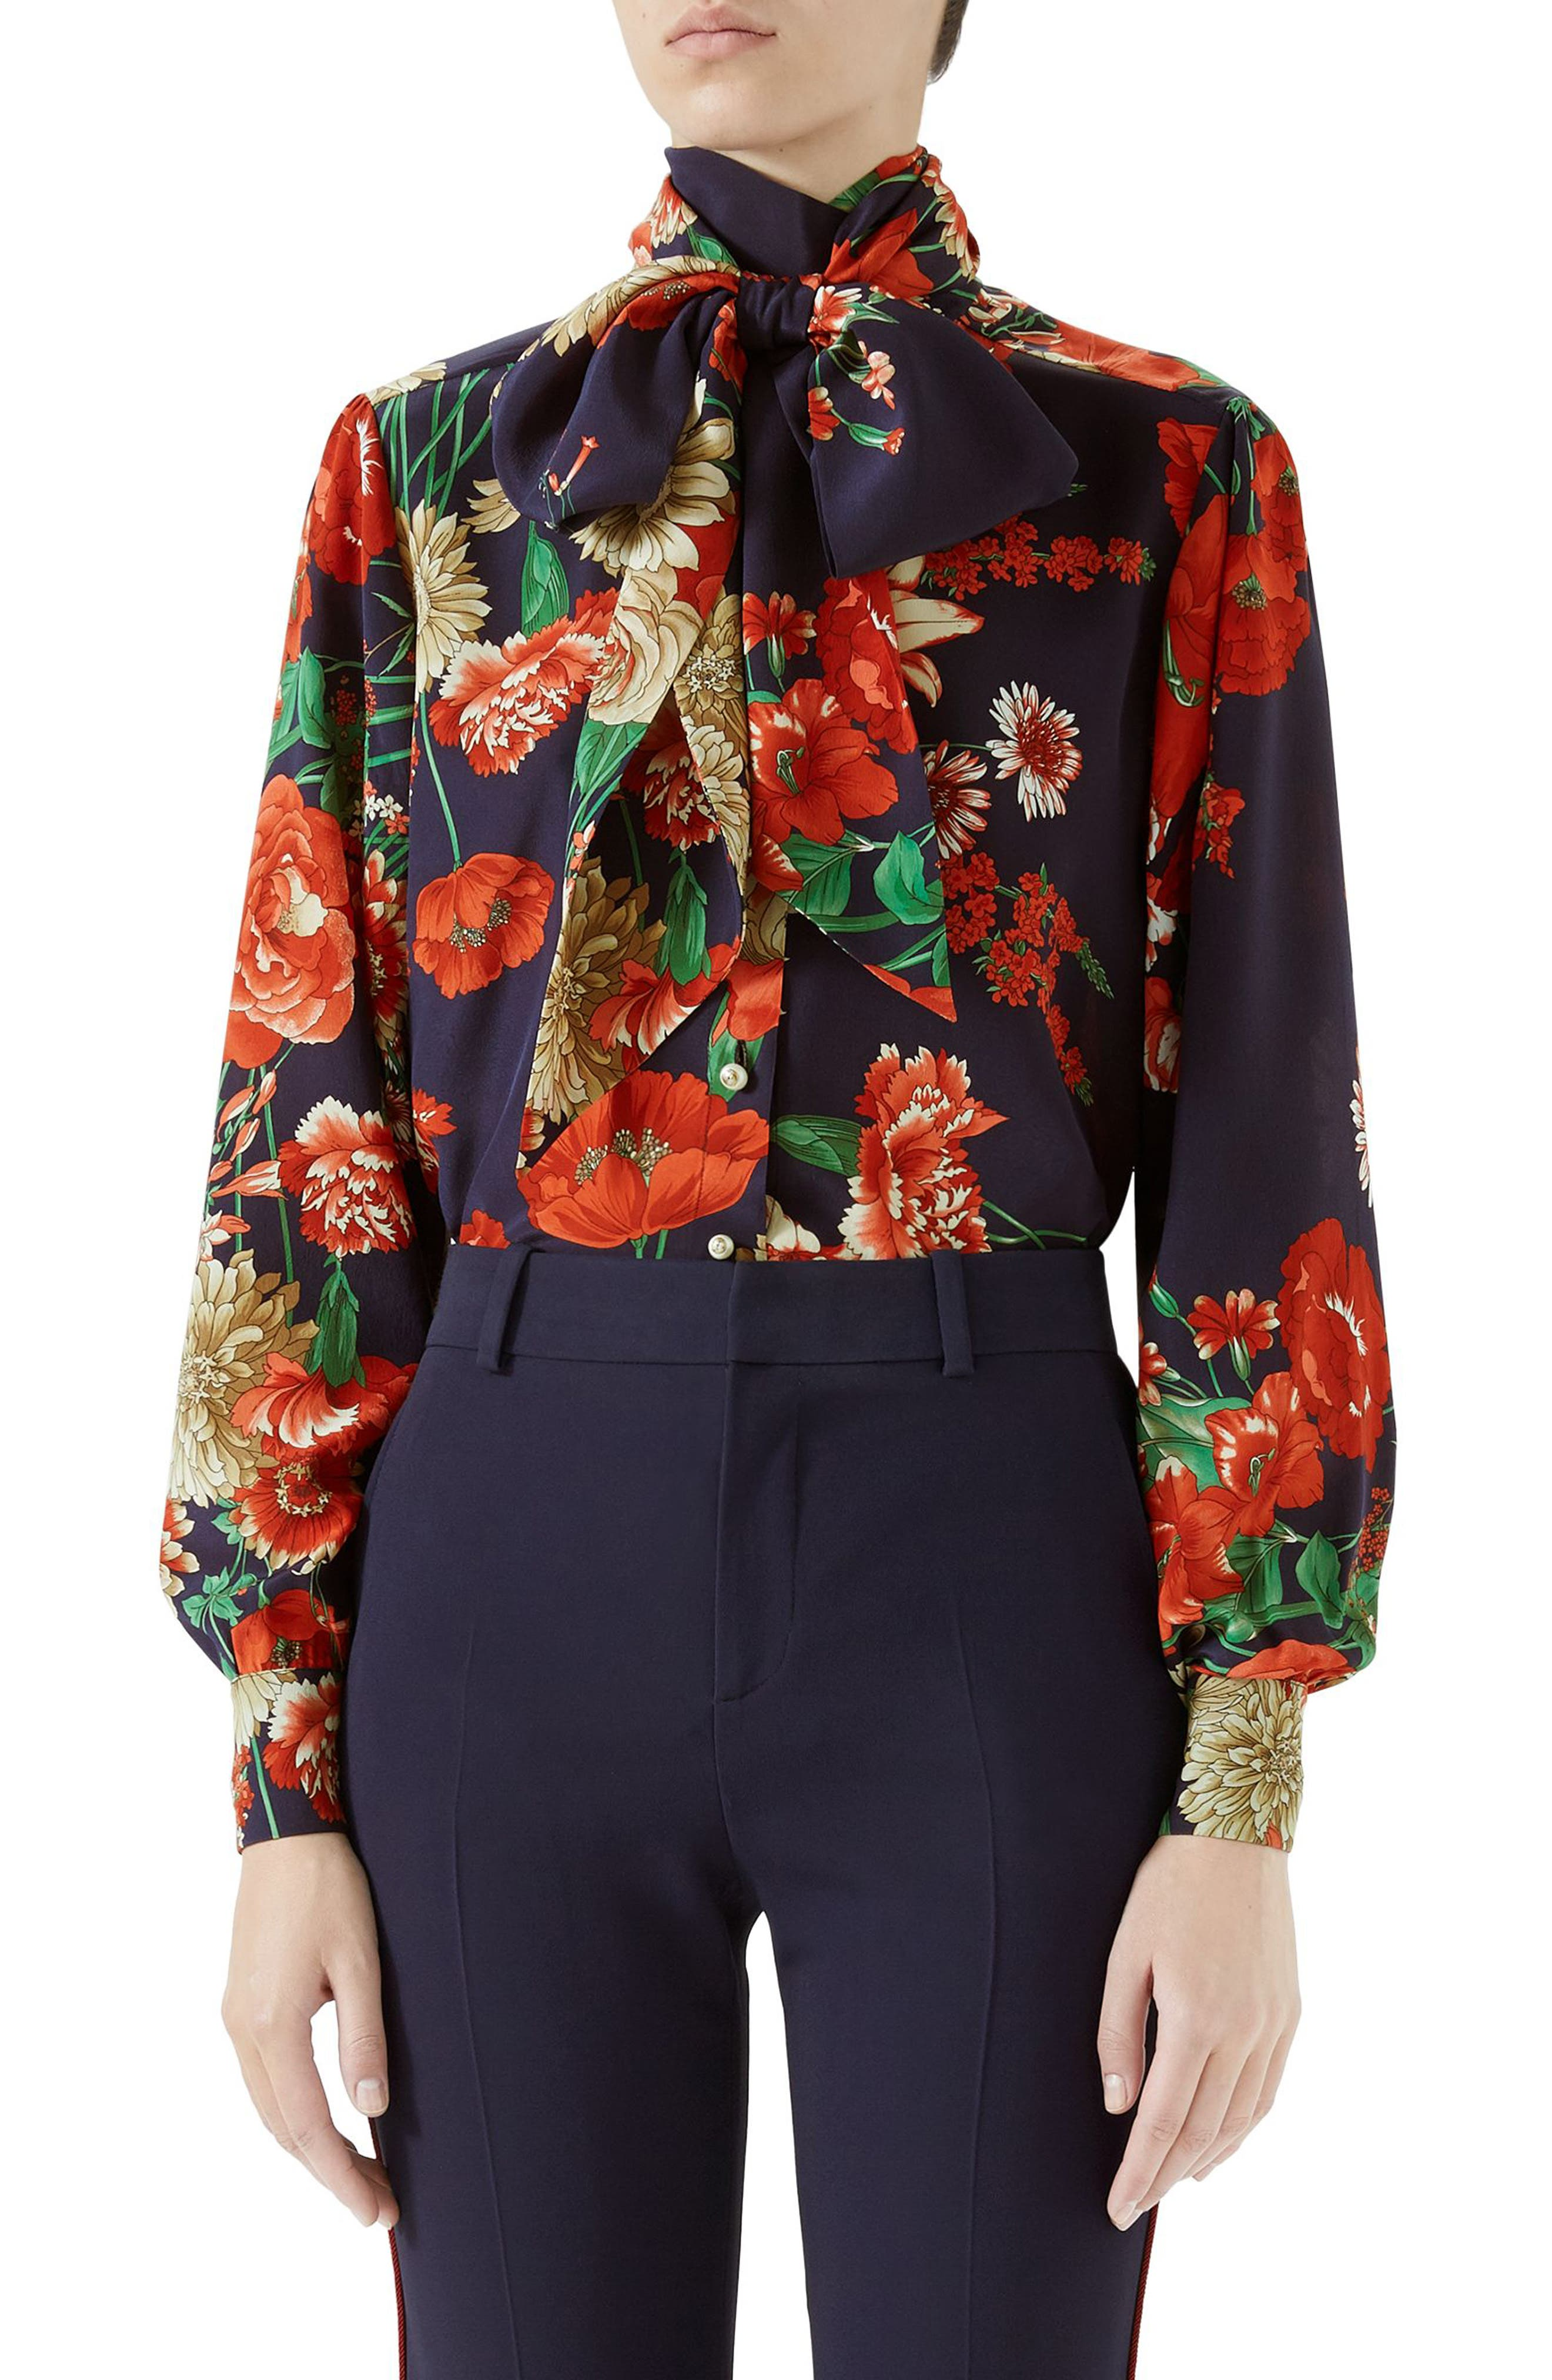 Gucci Spring Bouquet Print Tie Neck Silk Blouse